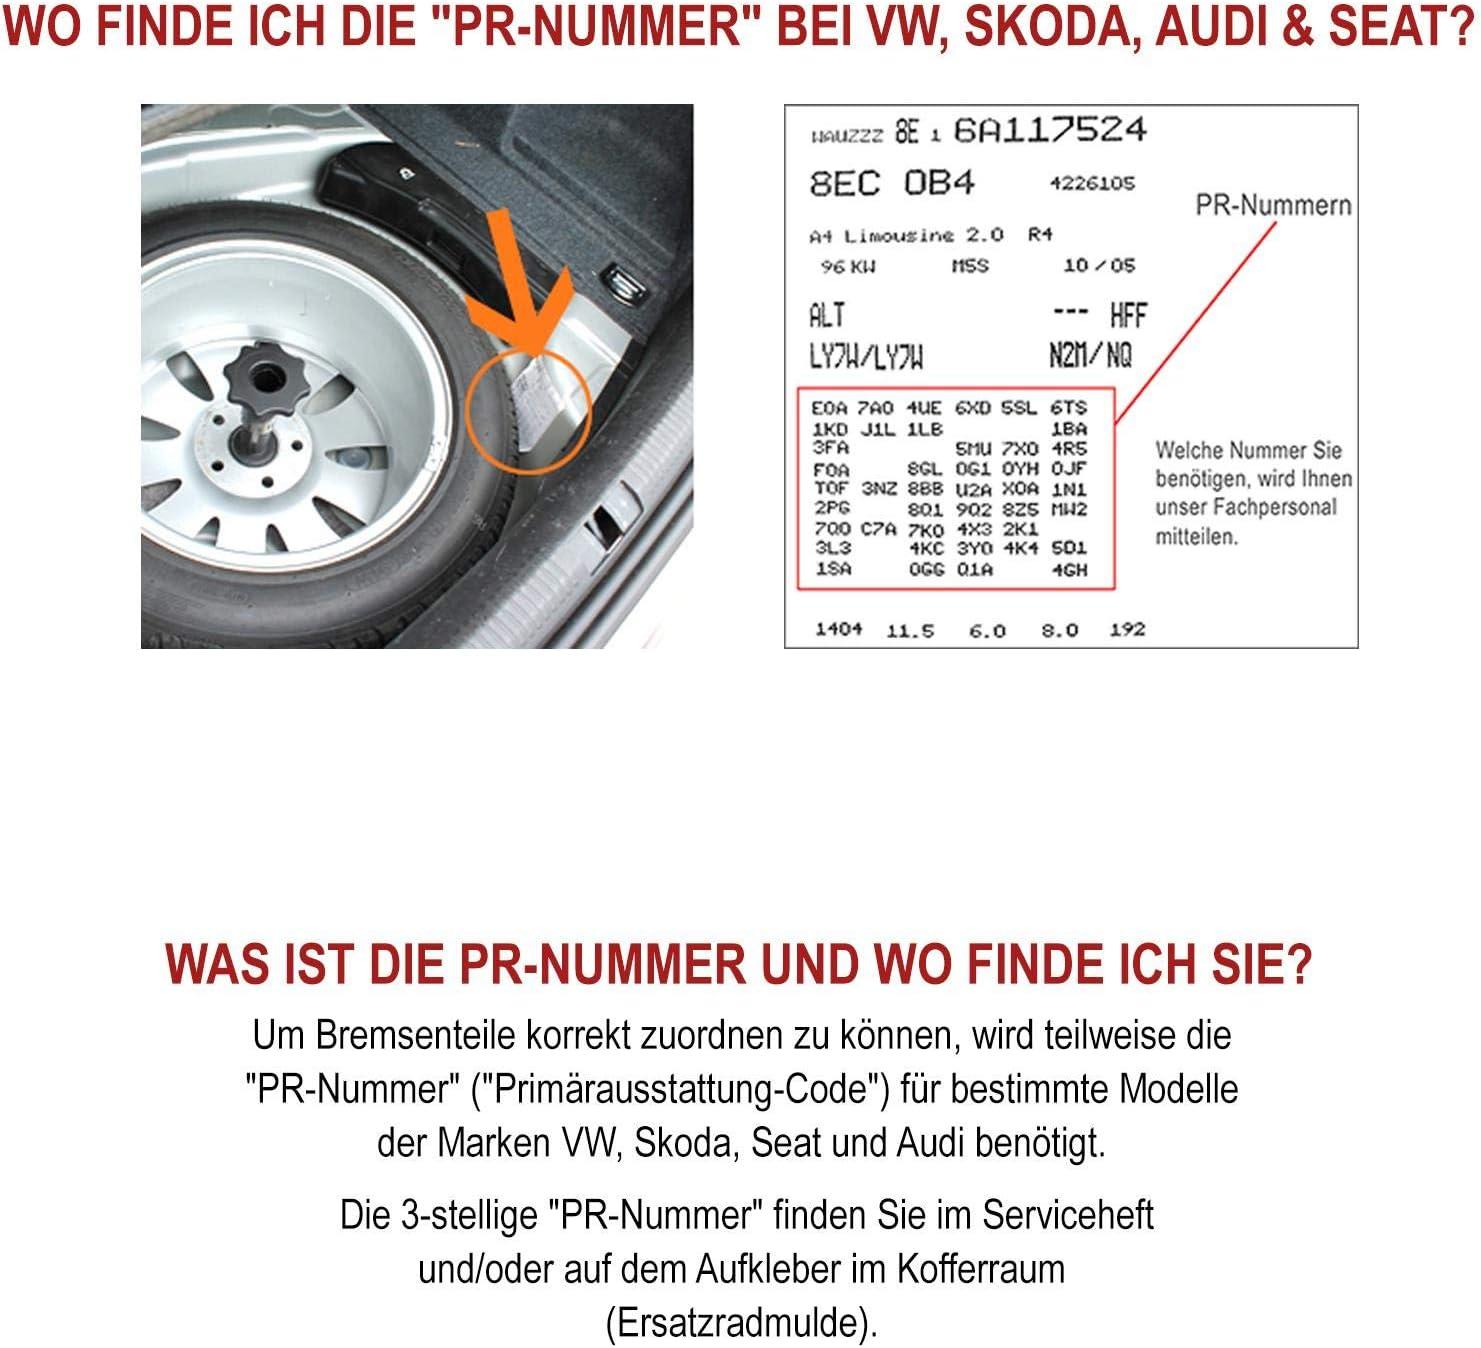 2x Bremssattel hinten links rechts NB PARTS GERMANY 10057778